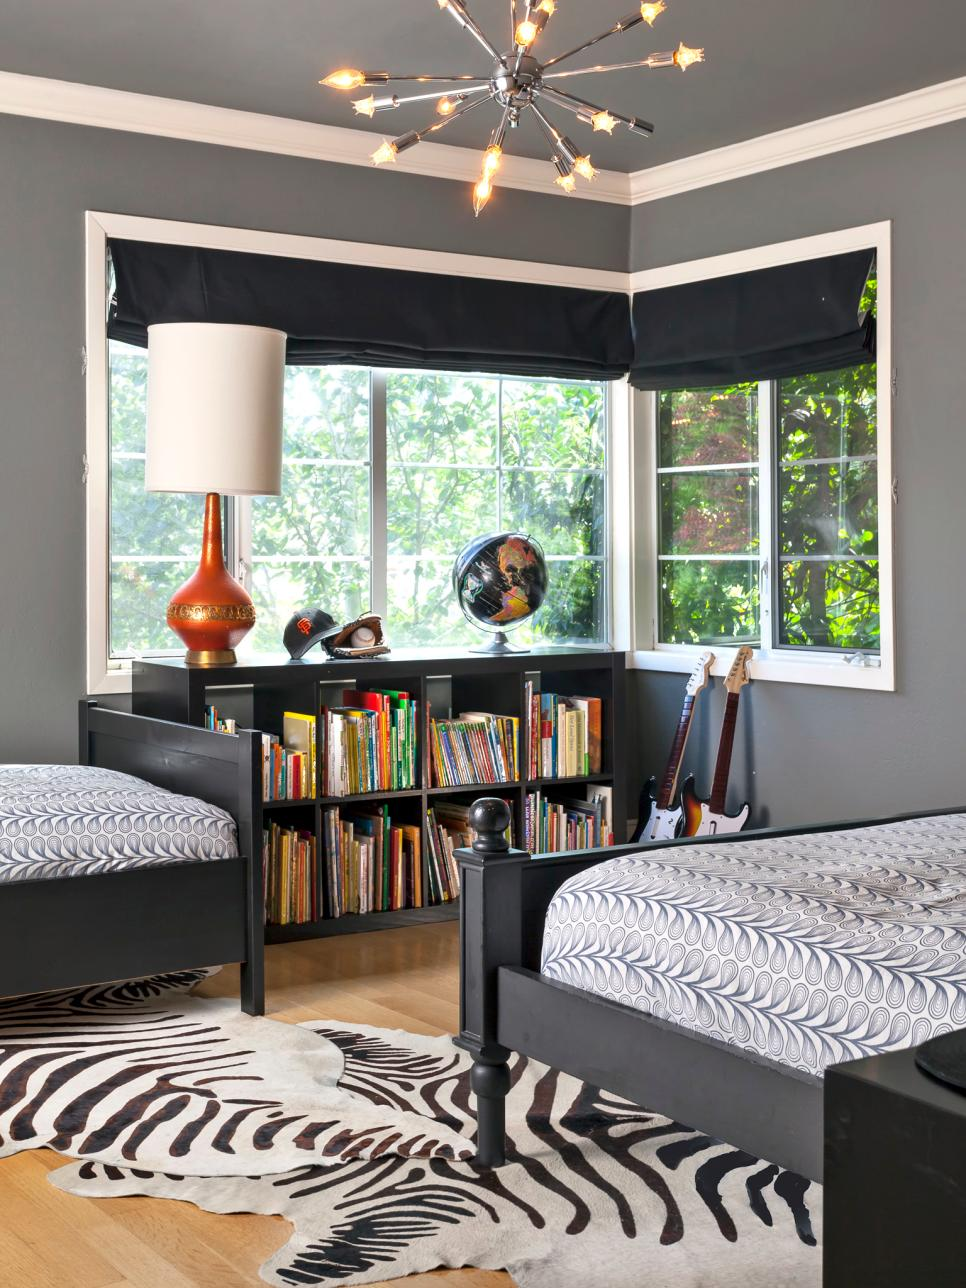 original_Holly-Bender-gray-black-white-bedroom-zebra-rug.jpg.rend.hgtvcom.966.1288